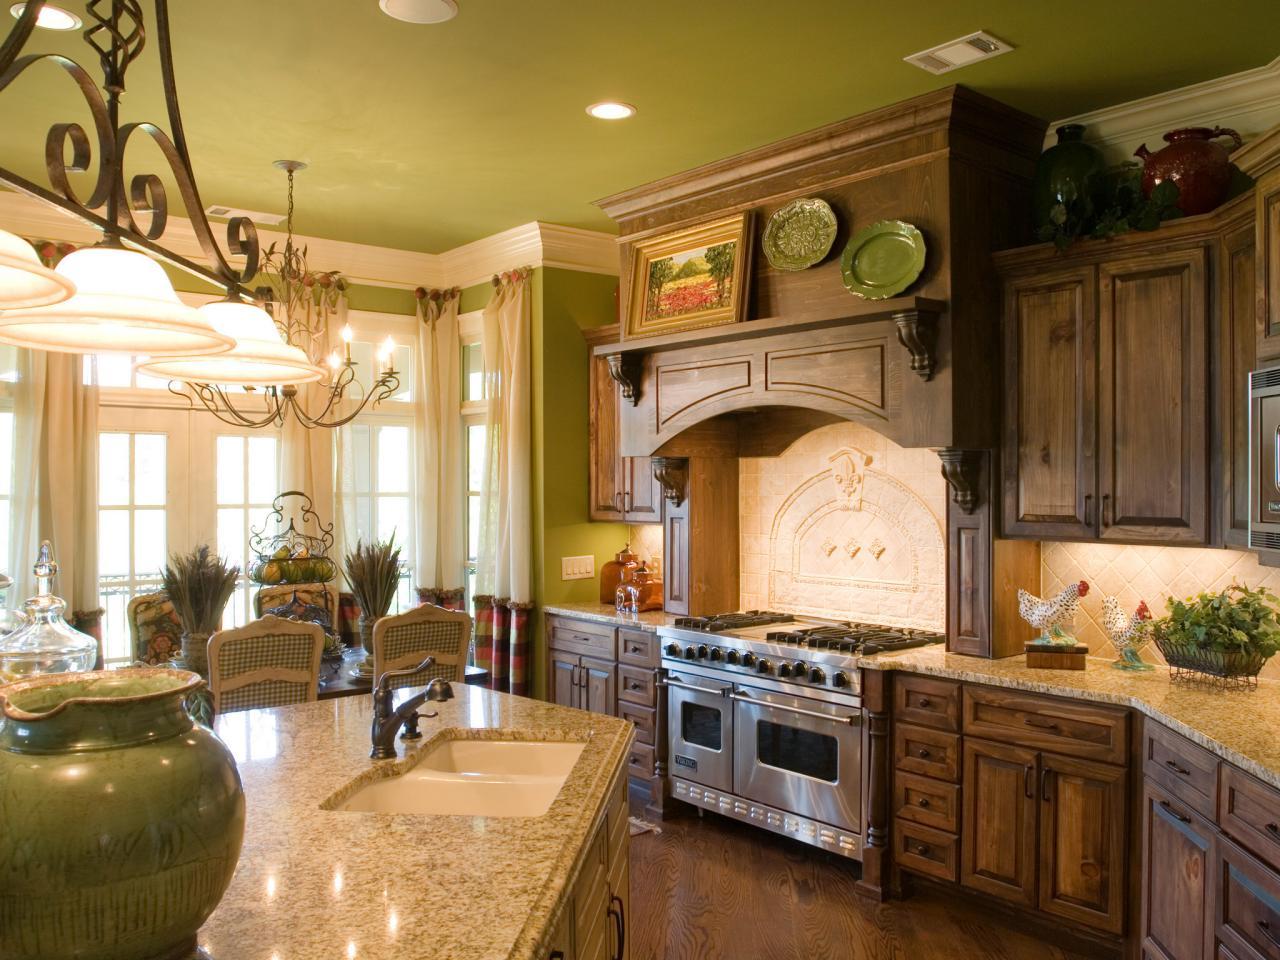 Stylish French country kitchen